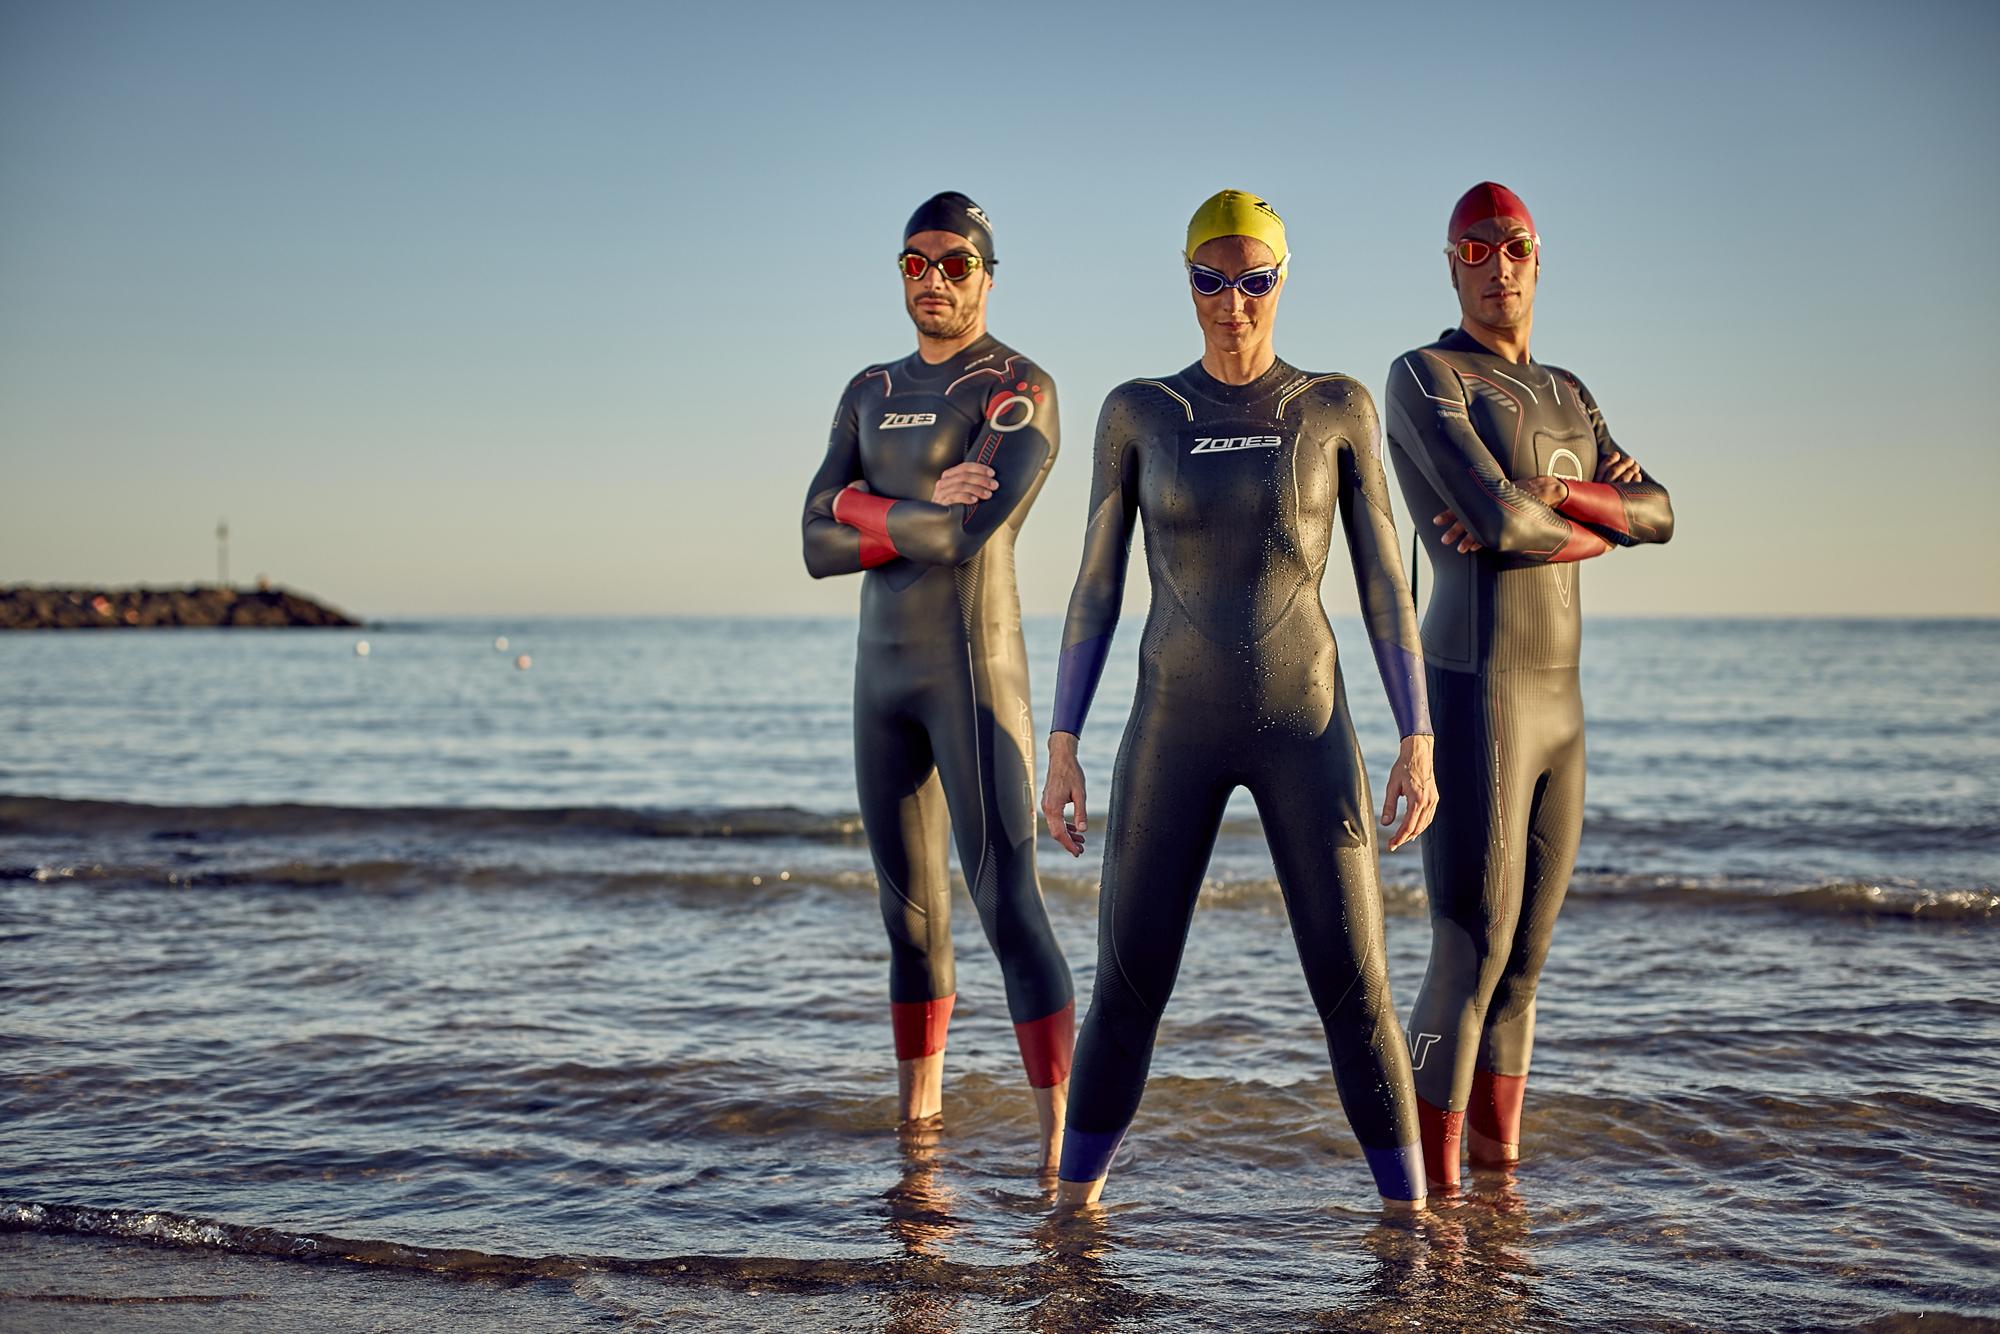 swim-cap-lifestyle-5-.jpg